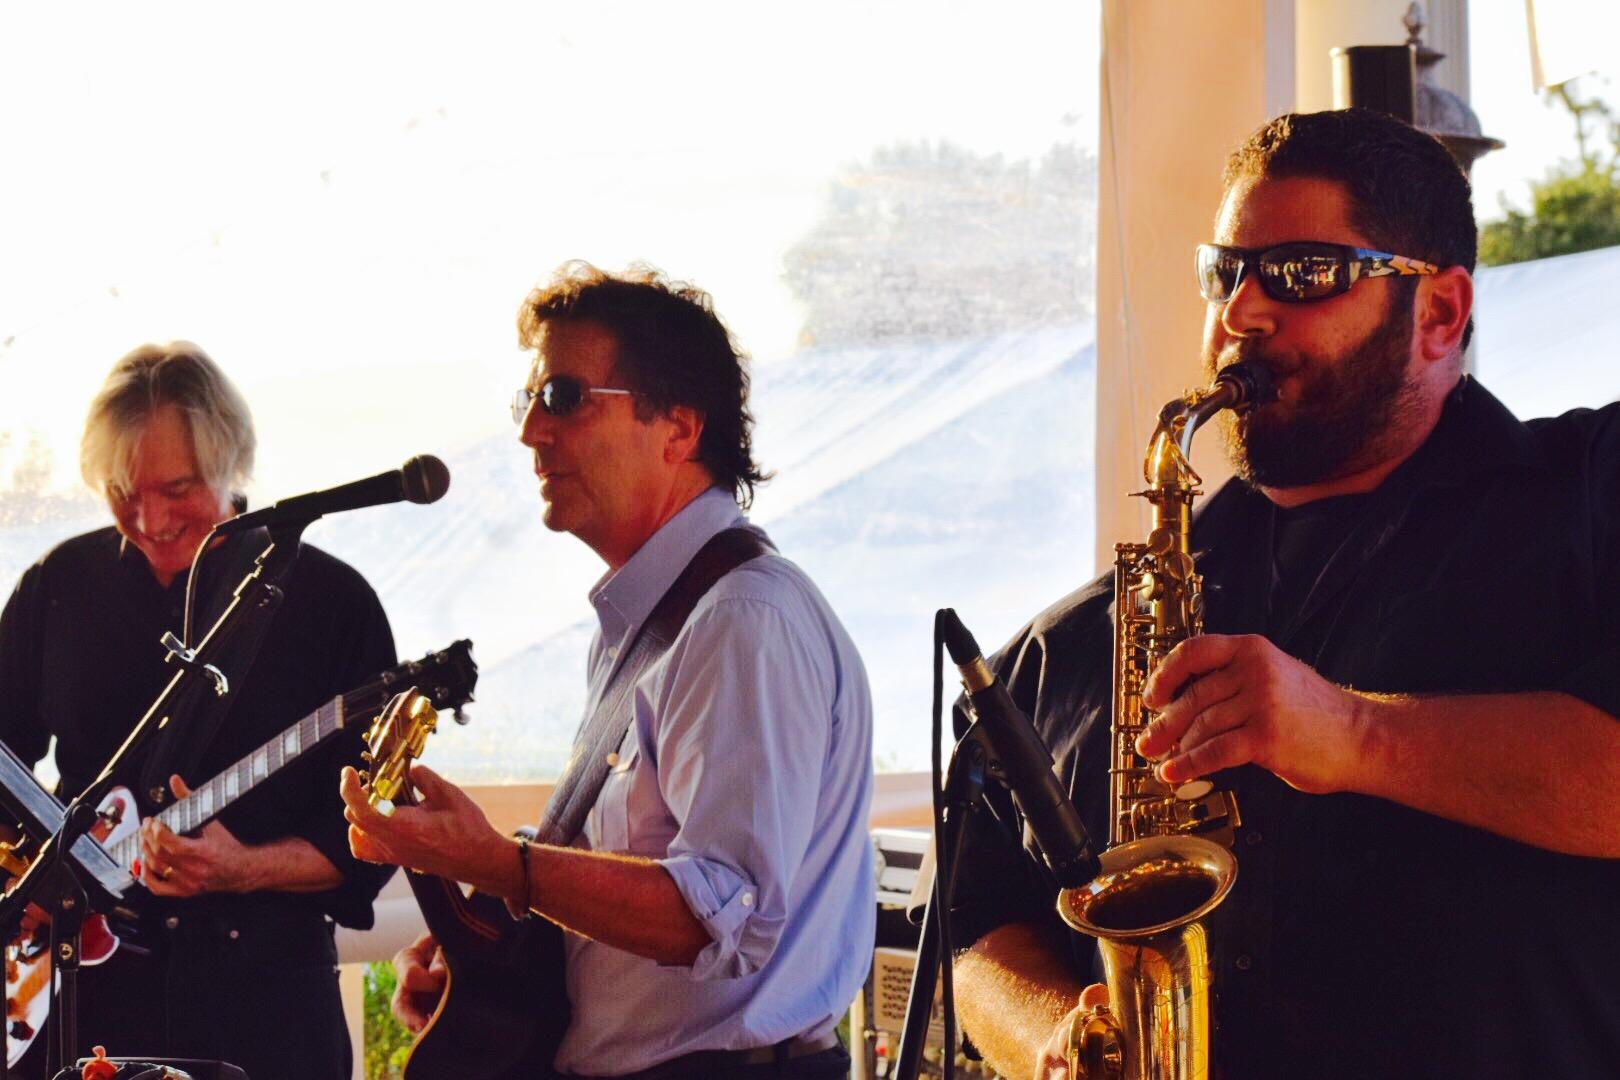 Lee Napier, David Neal Carroll, & Jarrod Valenti